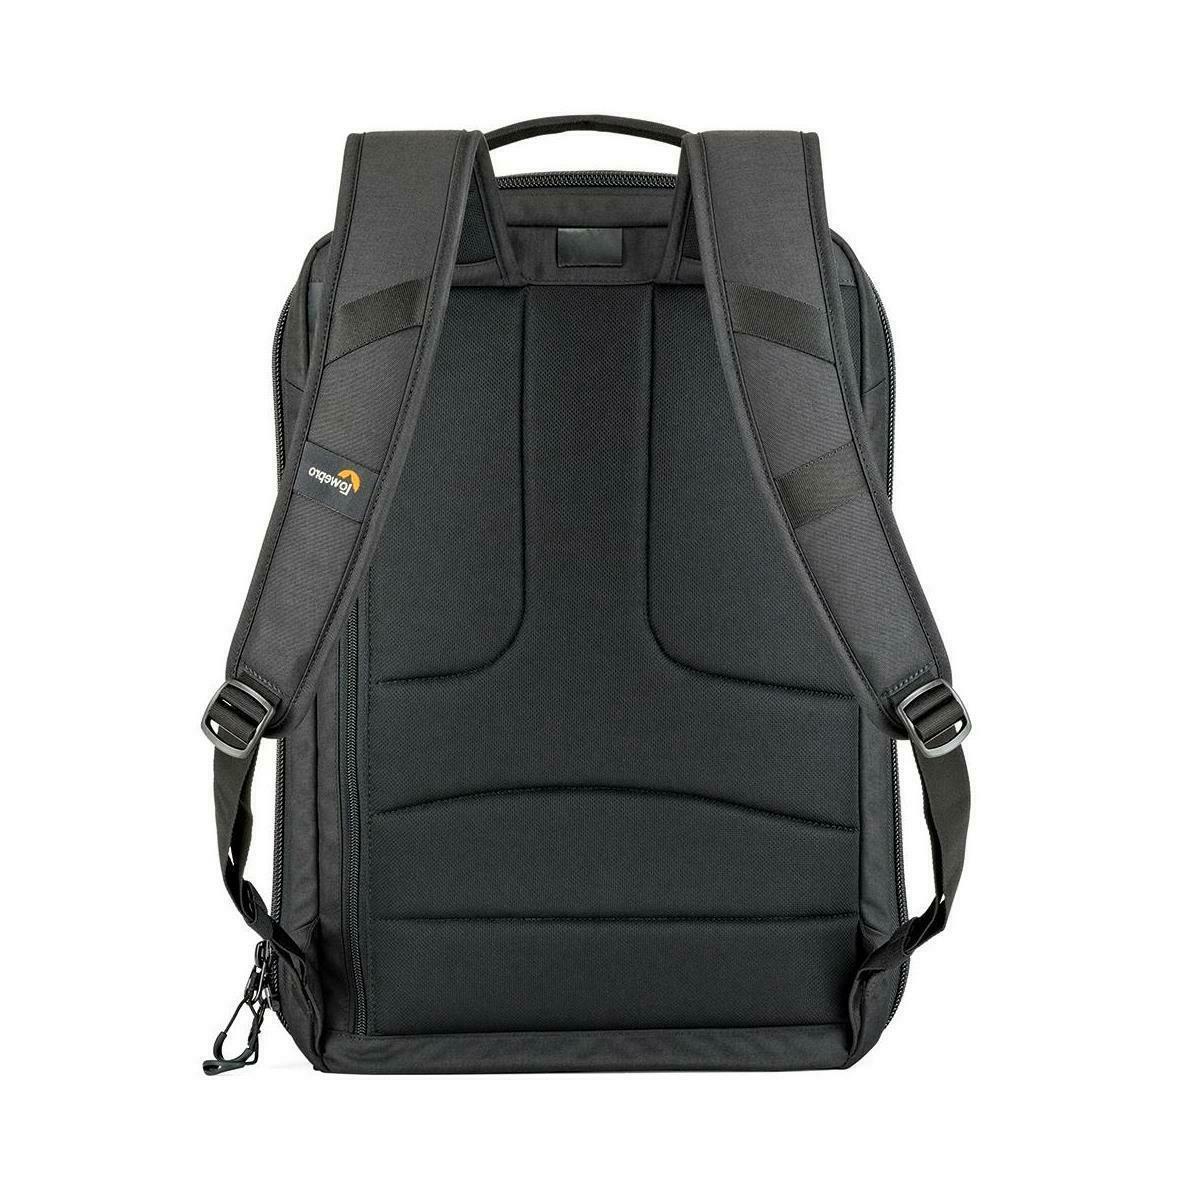 Lowepro Camera Backpack DJI Phantom Drone